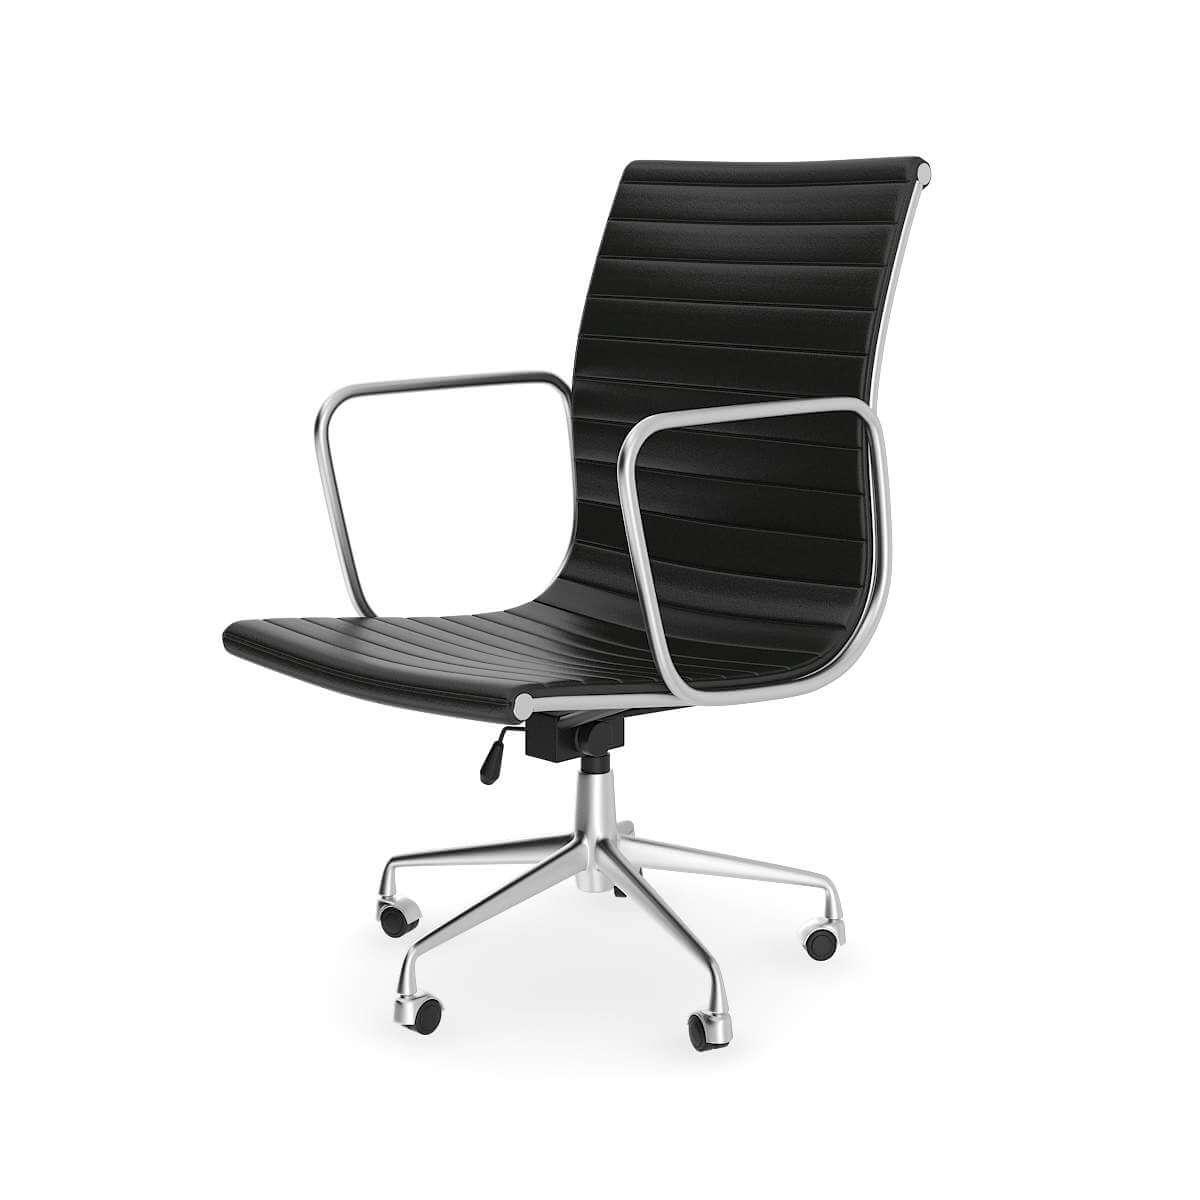 Black Leather Swivel Chair 3d Model